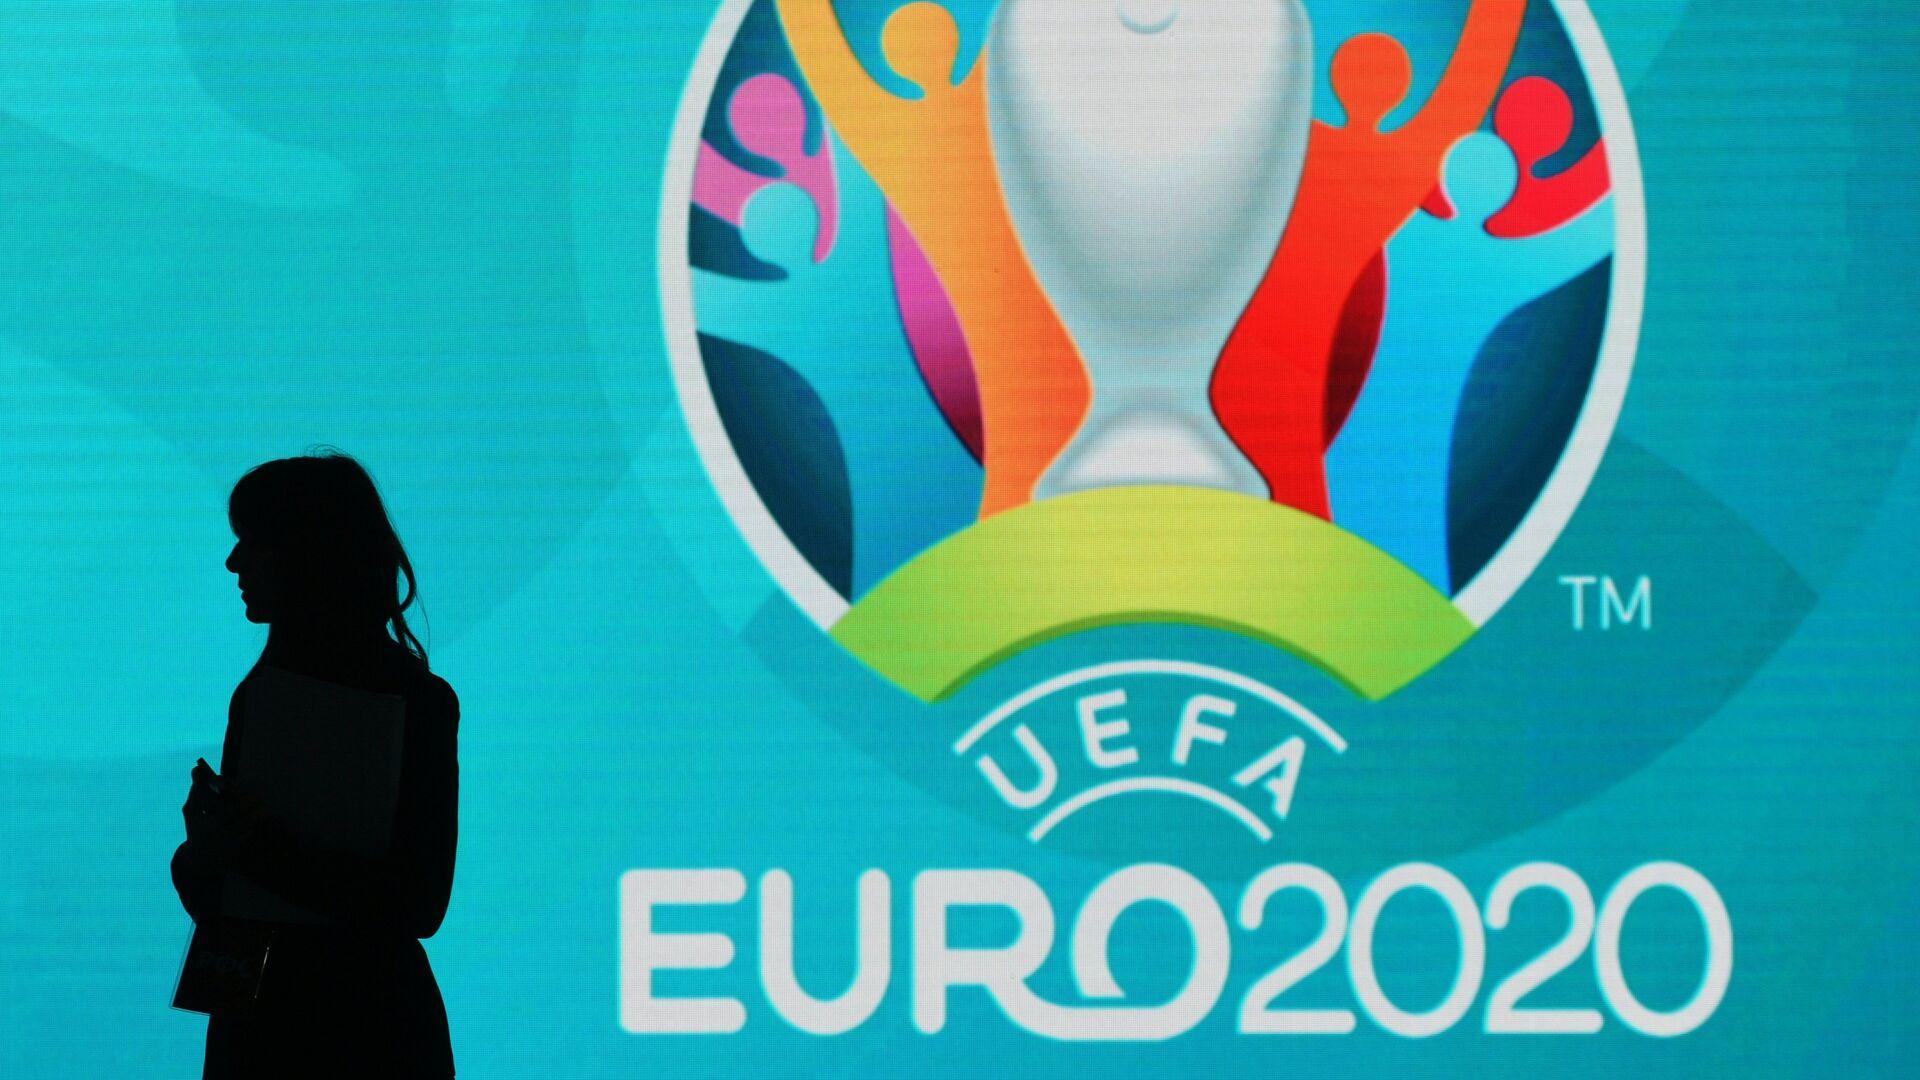 Логотип Евро-2020 по футболу - РИА Новости, 1920, 09.04.2021